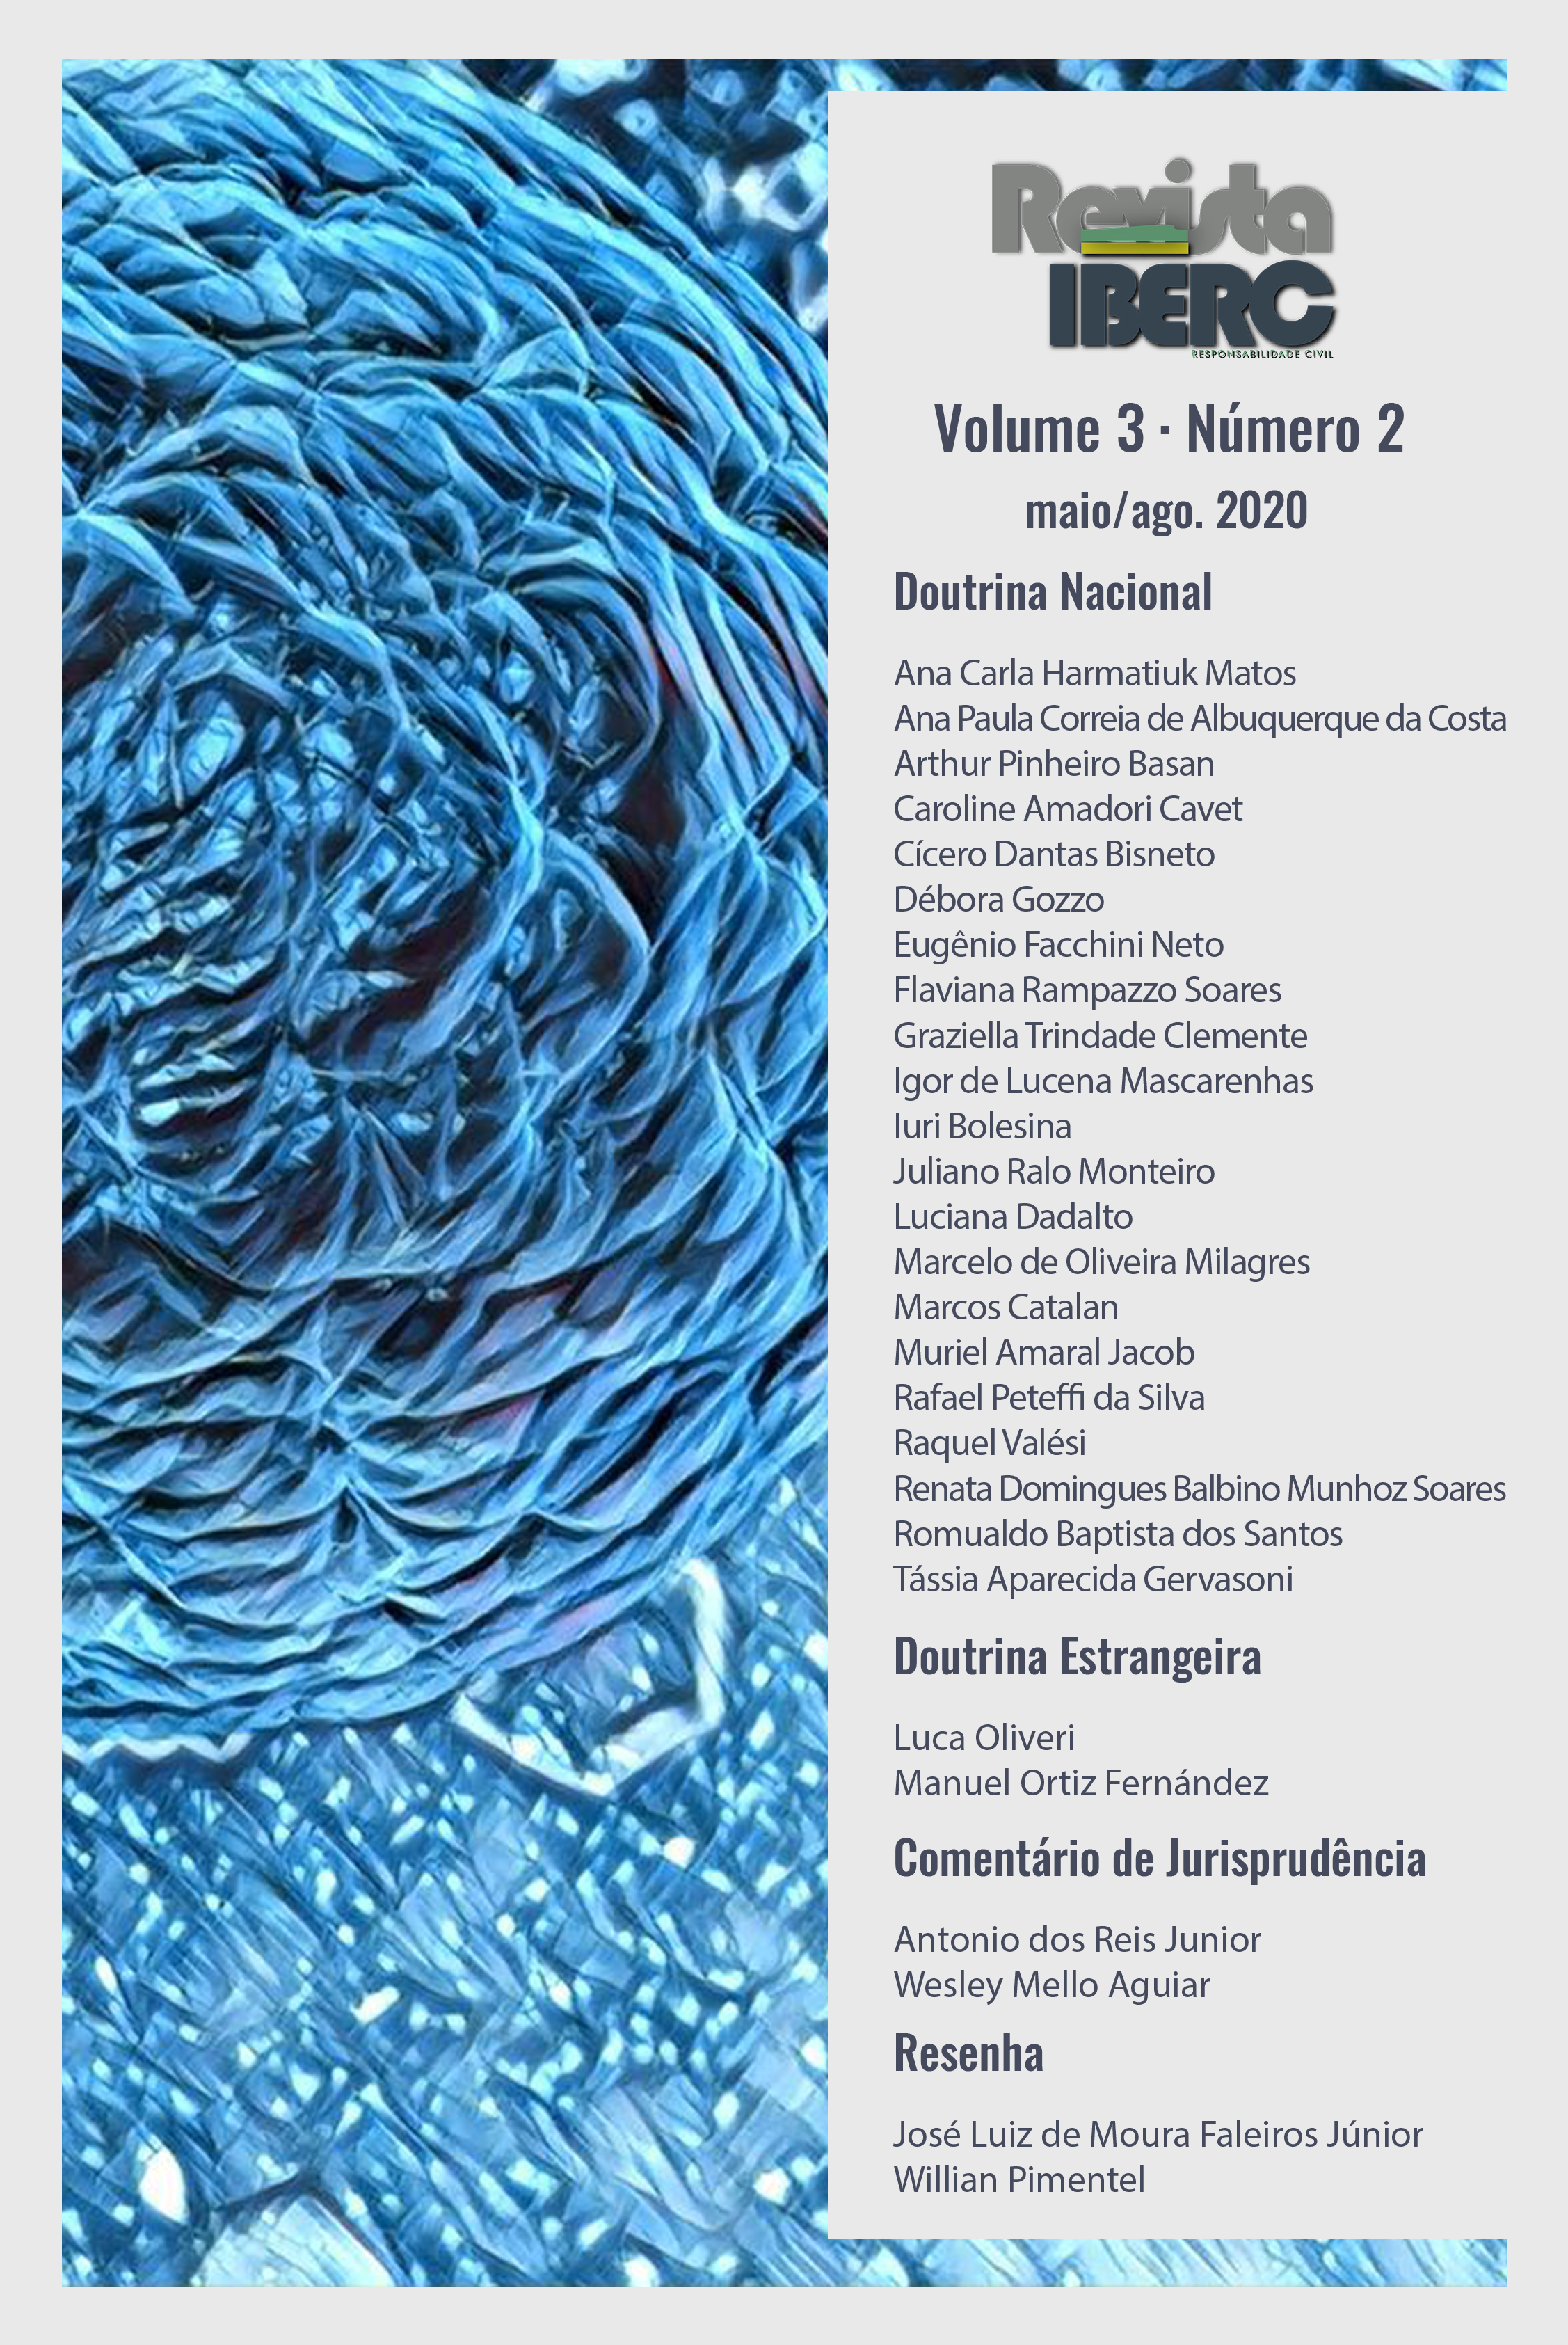 Capa da Revista IBERC - Volume 3 - Número 2